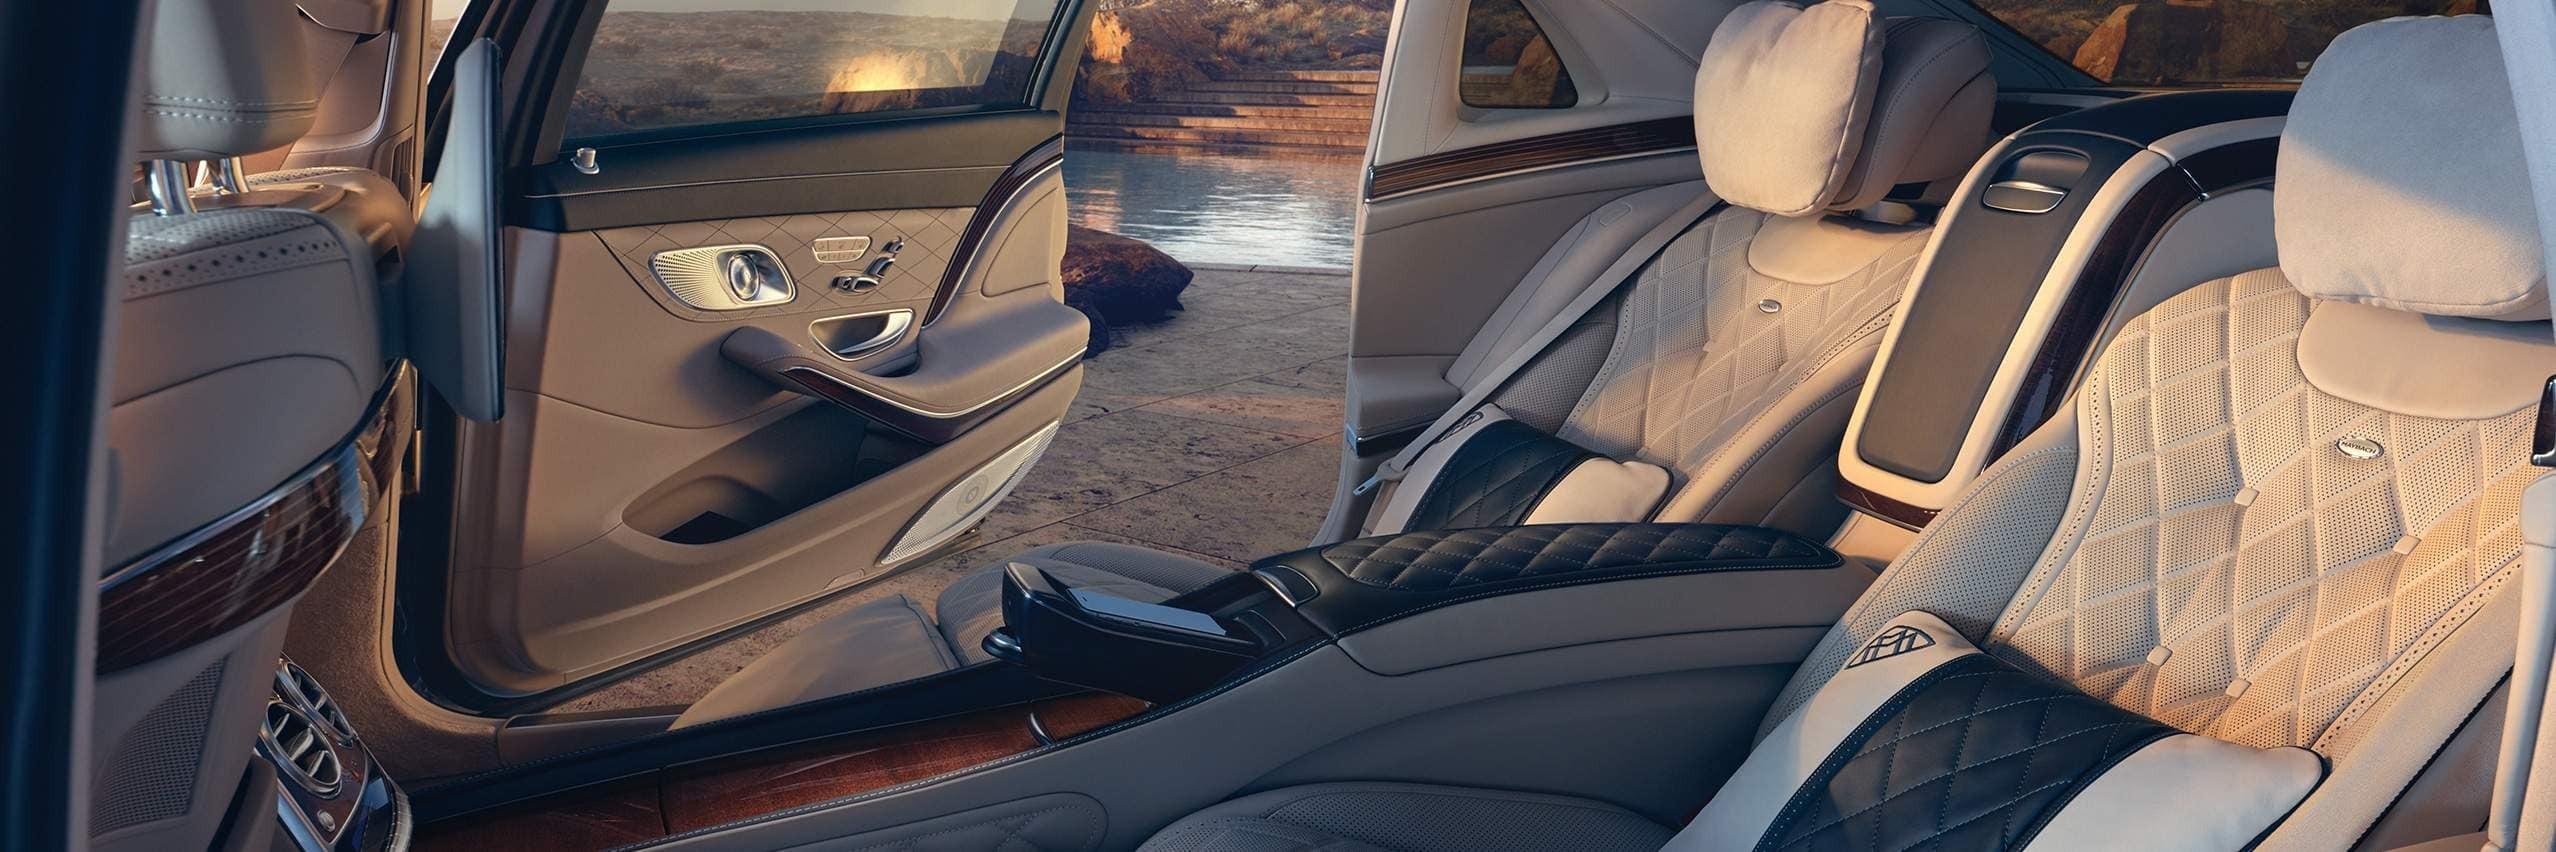 КомфортMercedes-Benz S-Class Sedan